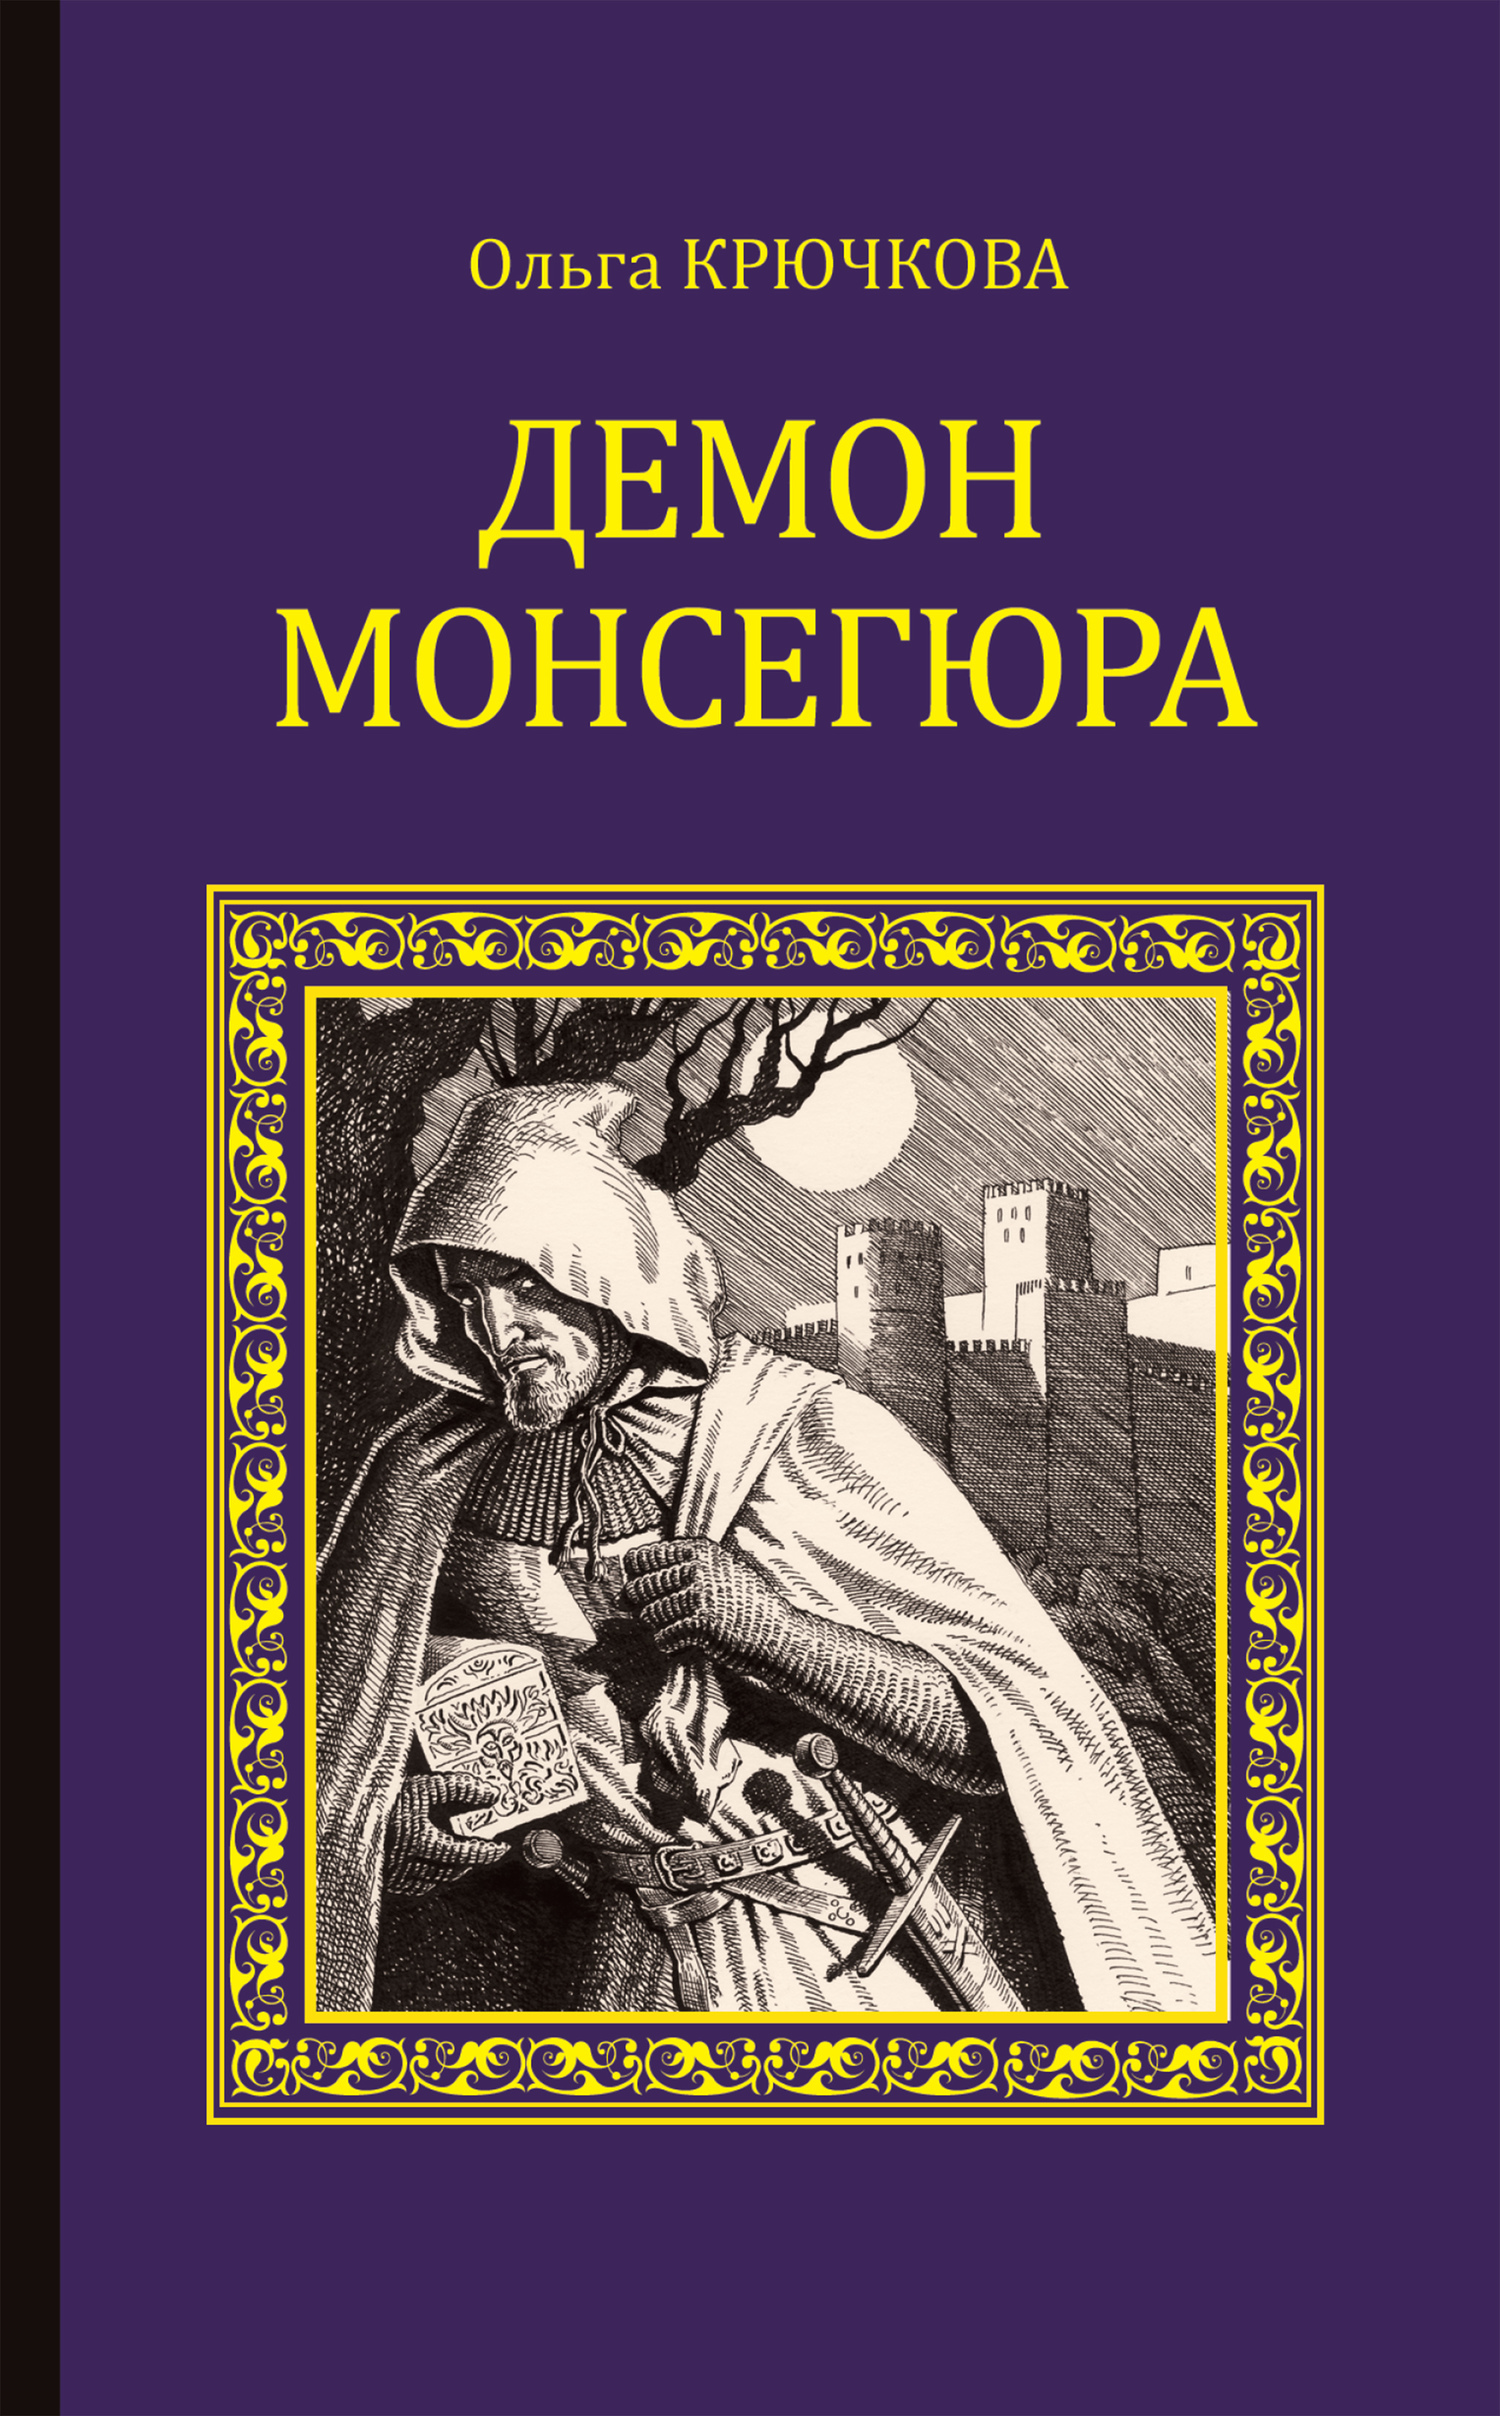 Ольга Крючкова. Демон Монсегюра